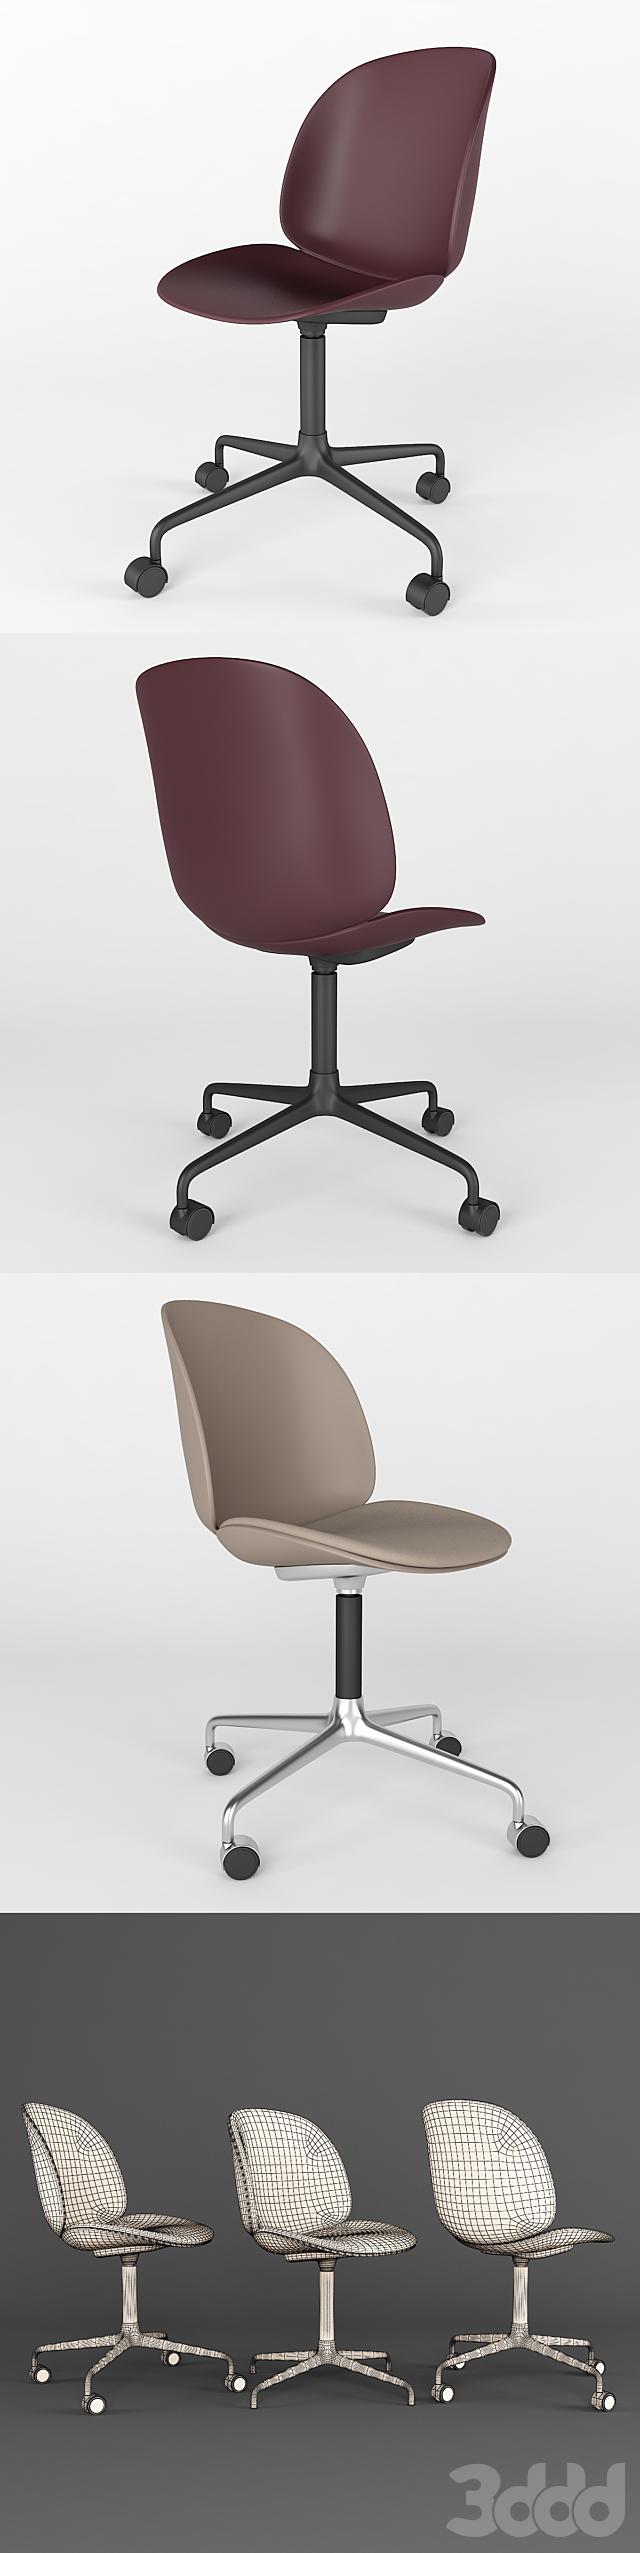 GUBI Beetle Meeting Chairs